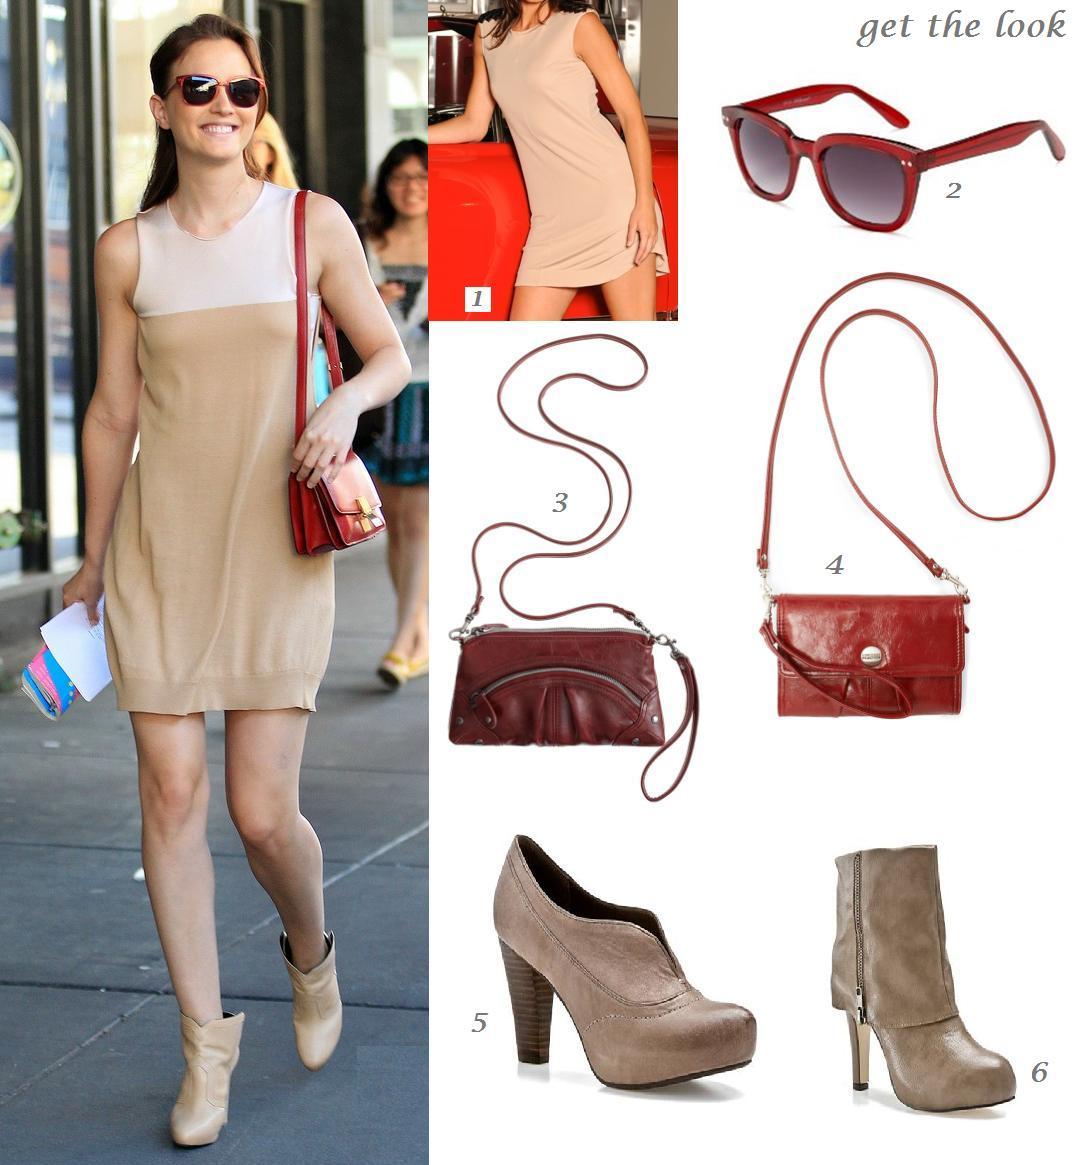 http://1.bp.blogspot.com/_u8fydAf_uGU/TI5Si4ANSBI/AAAAAAAACUo/zhMtr-QL84s/s1600/Leighton+Meester+Nude+Dress+Look.jpg